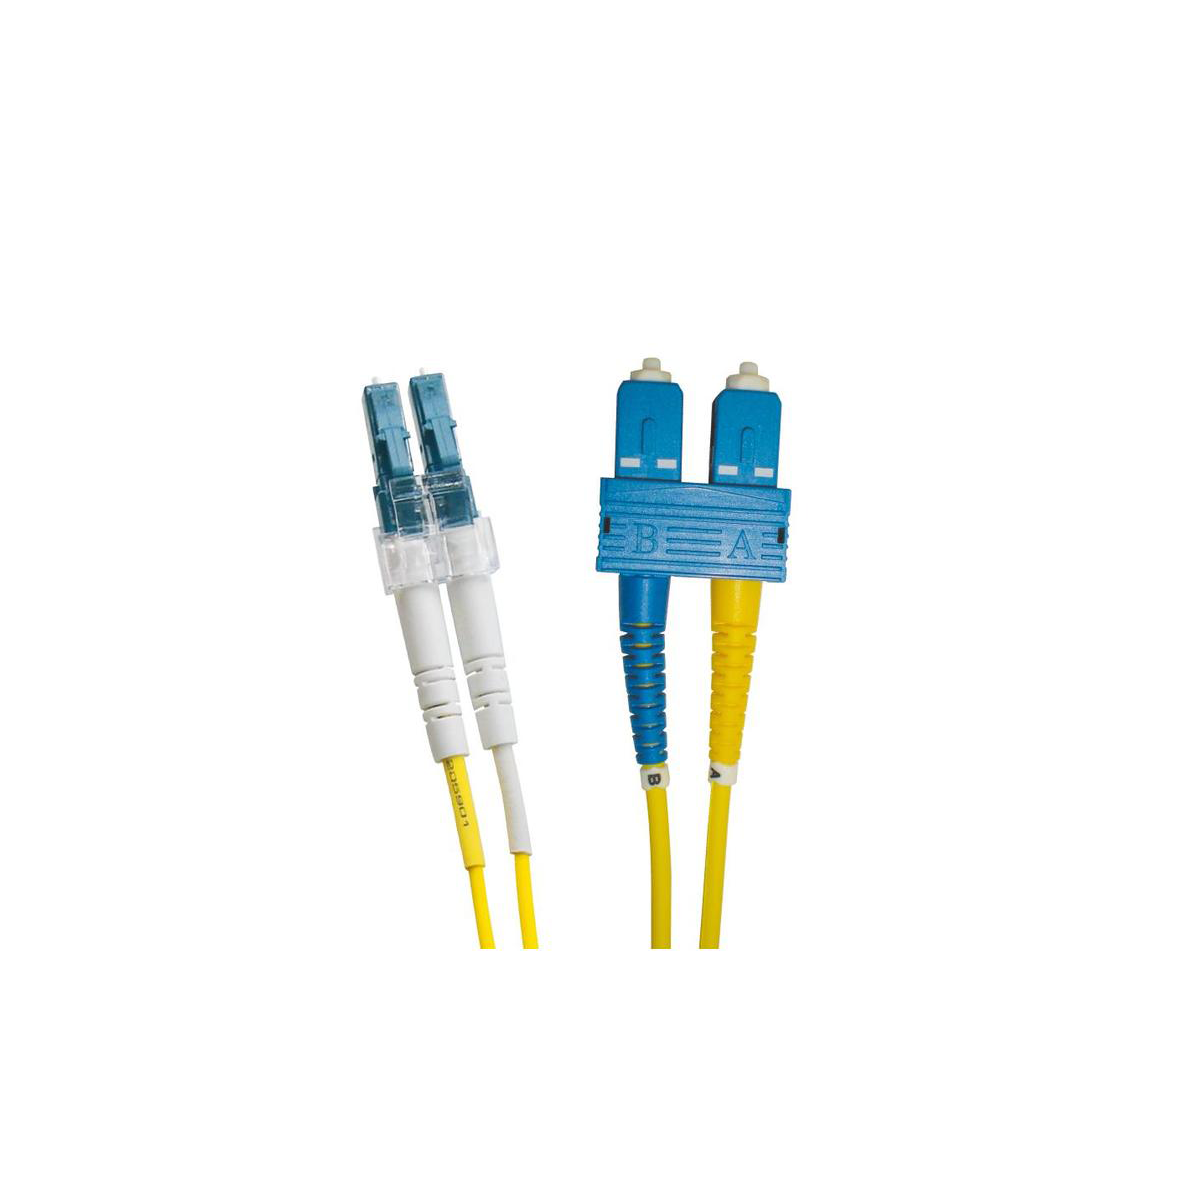 EXCEL OS2 3M LC-SC DUPLEX P/LEAD 9/125